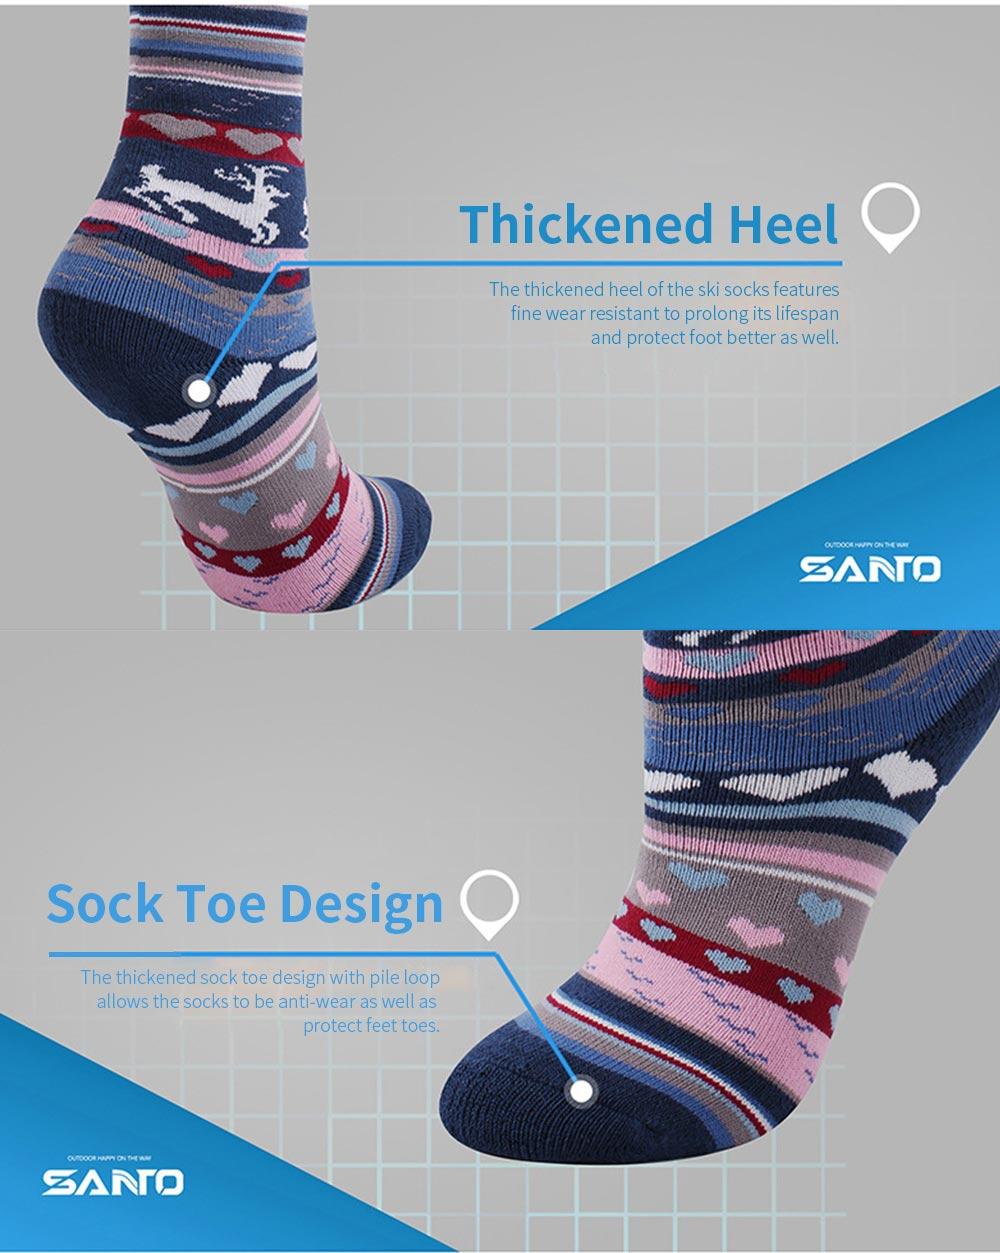 SANTO Ski Socks for Winter Outdoor Activities Thickened Cotton Socks Kids' Lightweight Thermal Socks Odor Resistant Socks 4